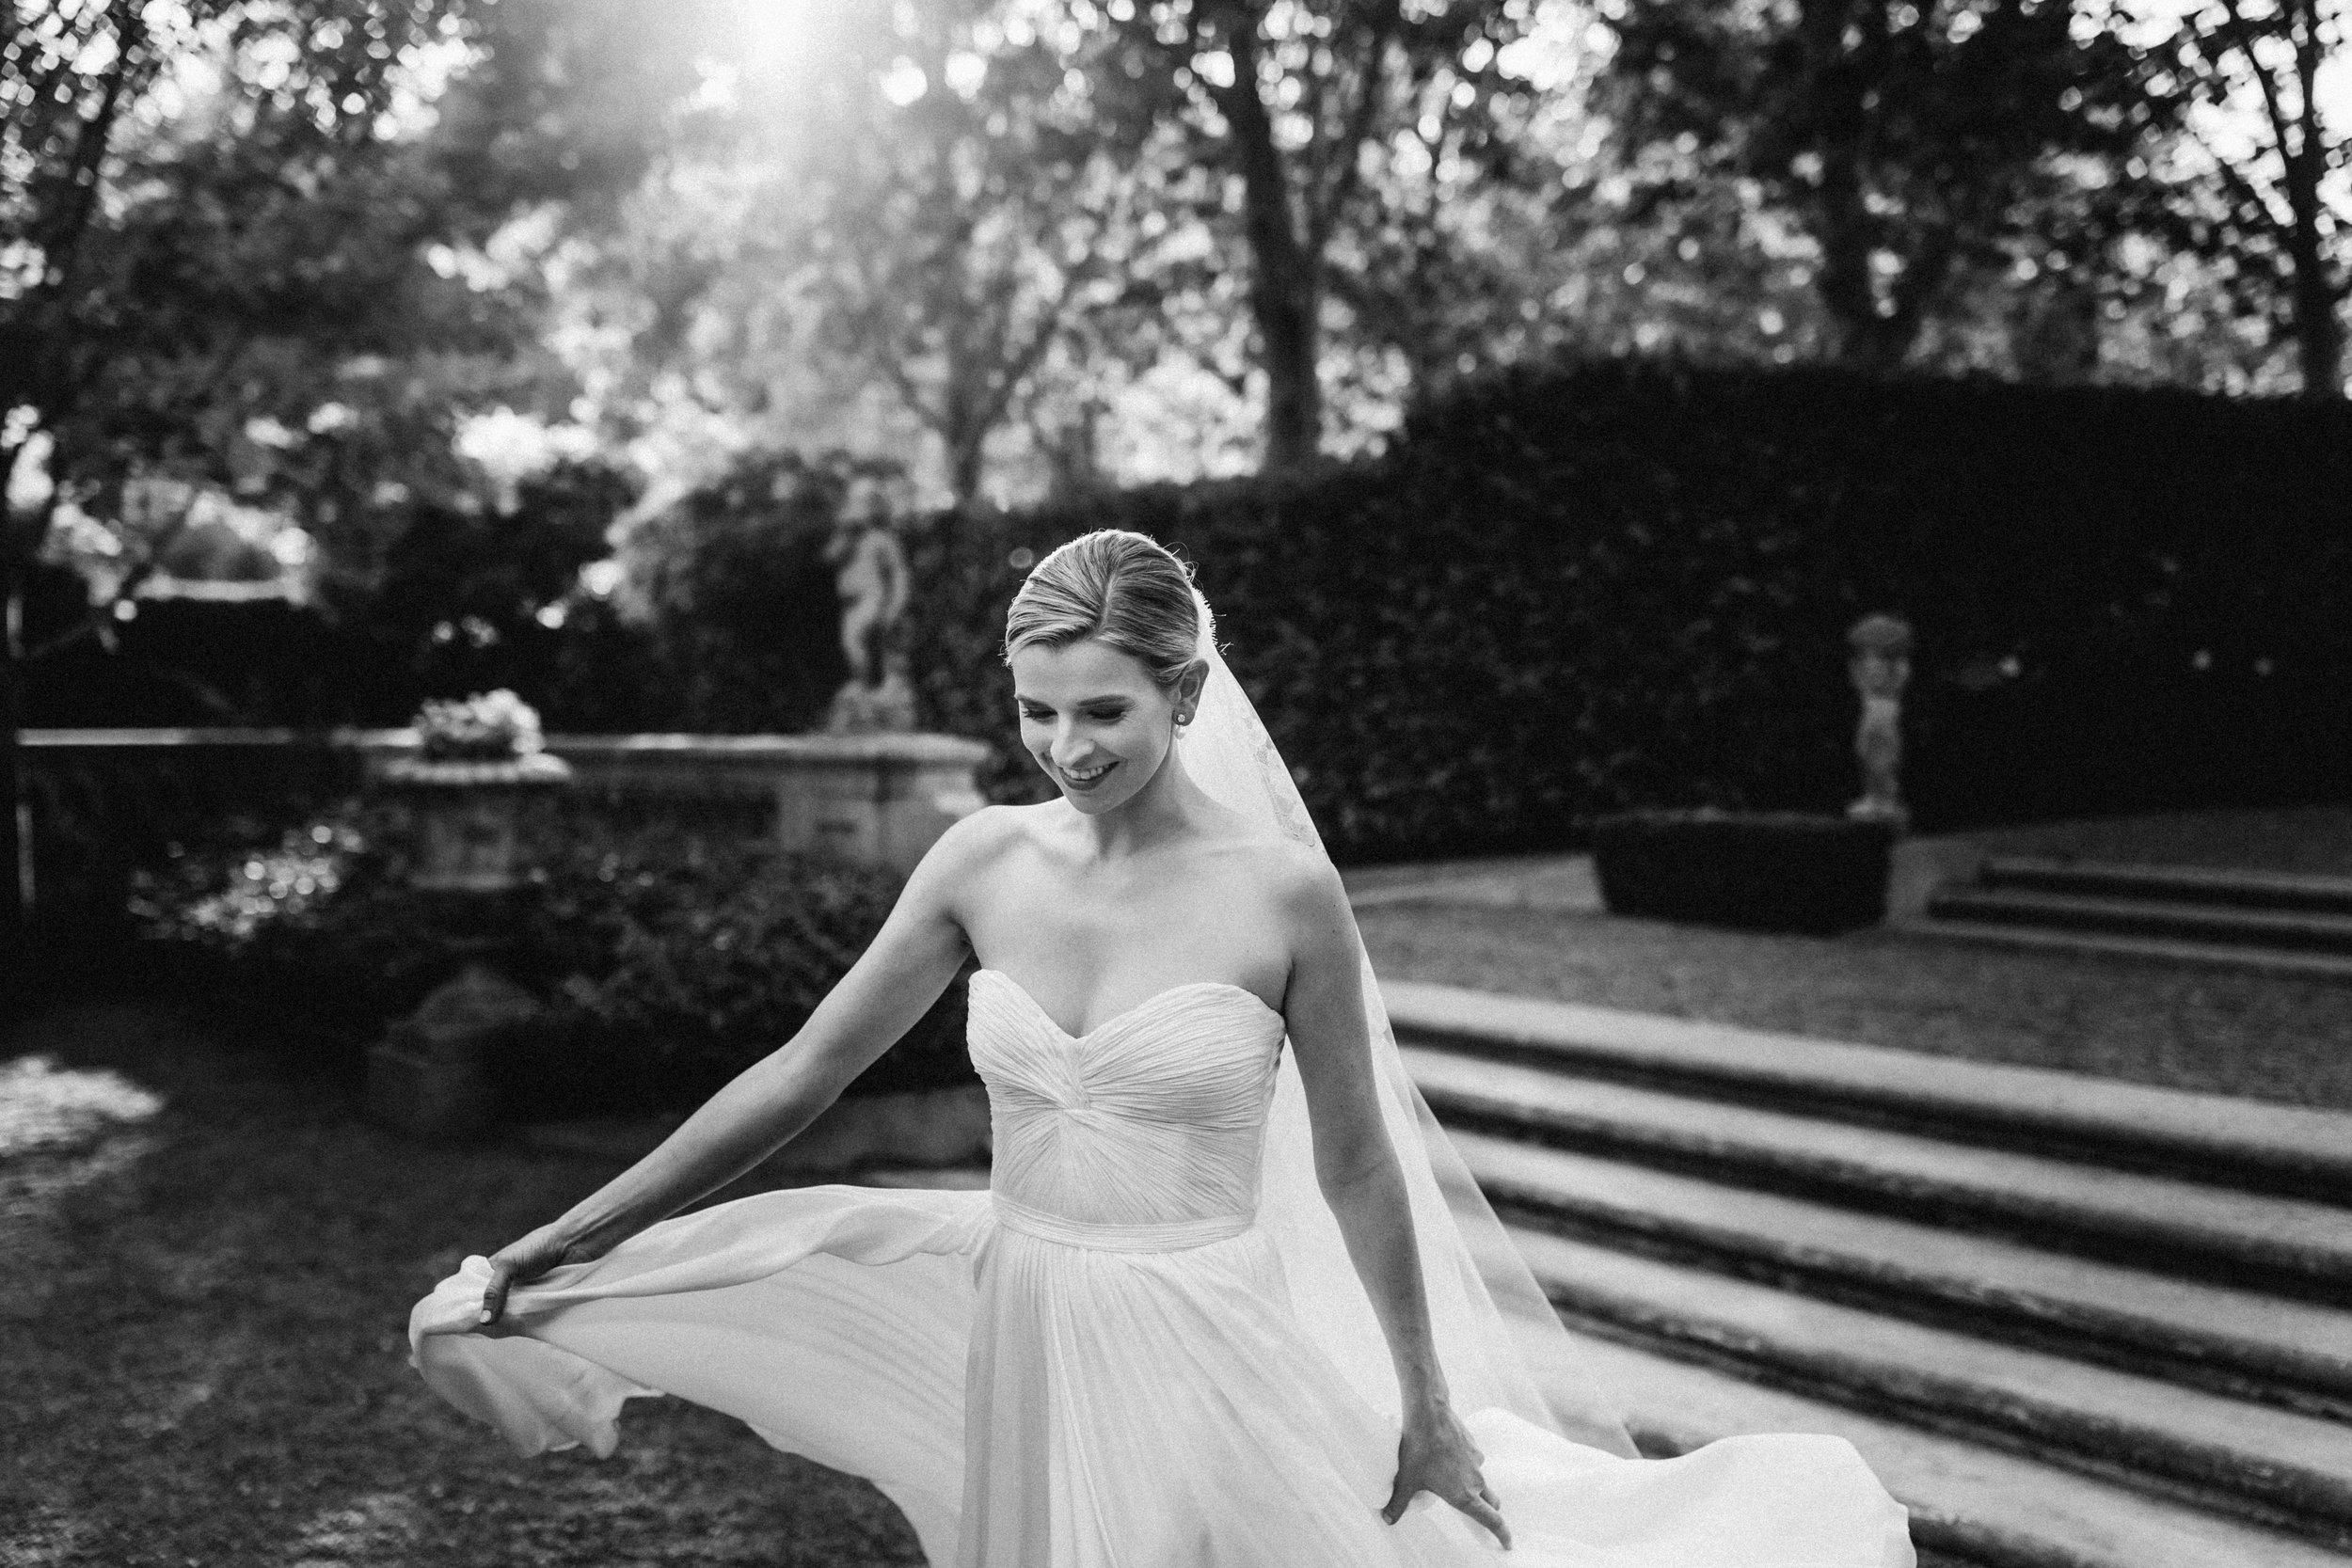 sarah-falugo-wedding-photographer-napa-valley-wedding-lauren-emery-0192.jpg